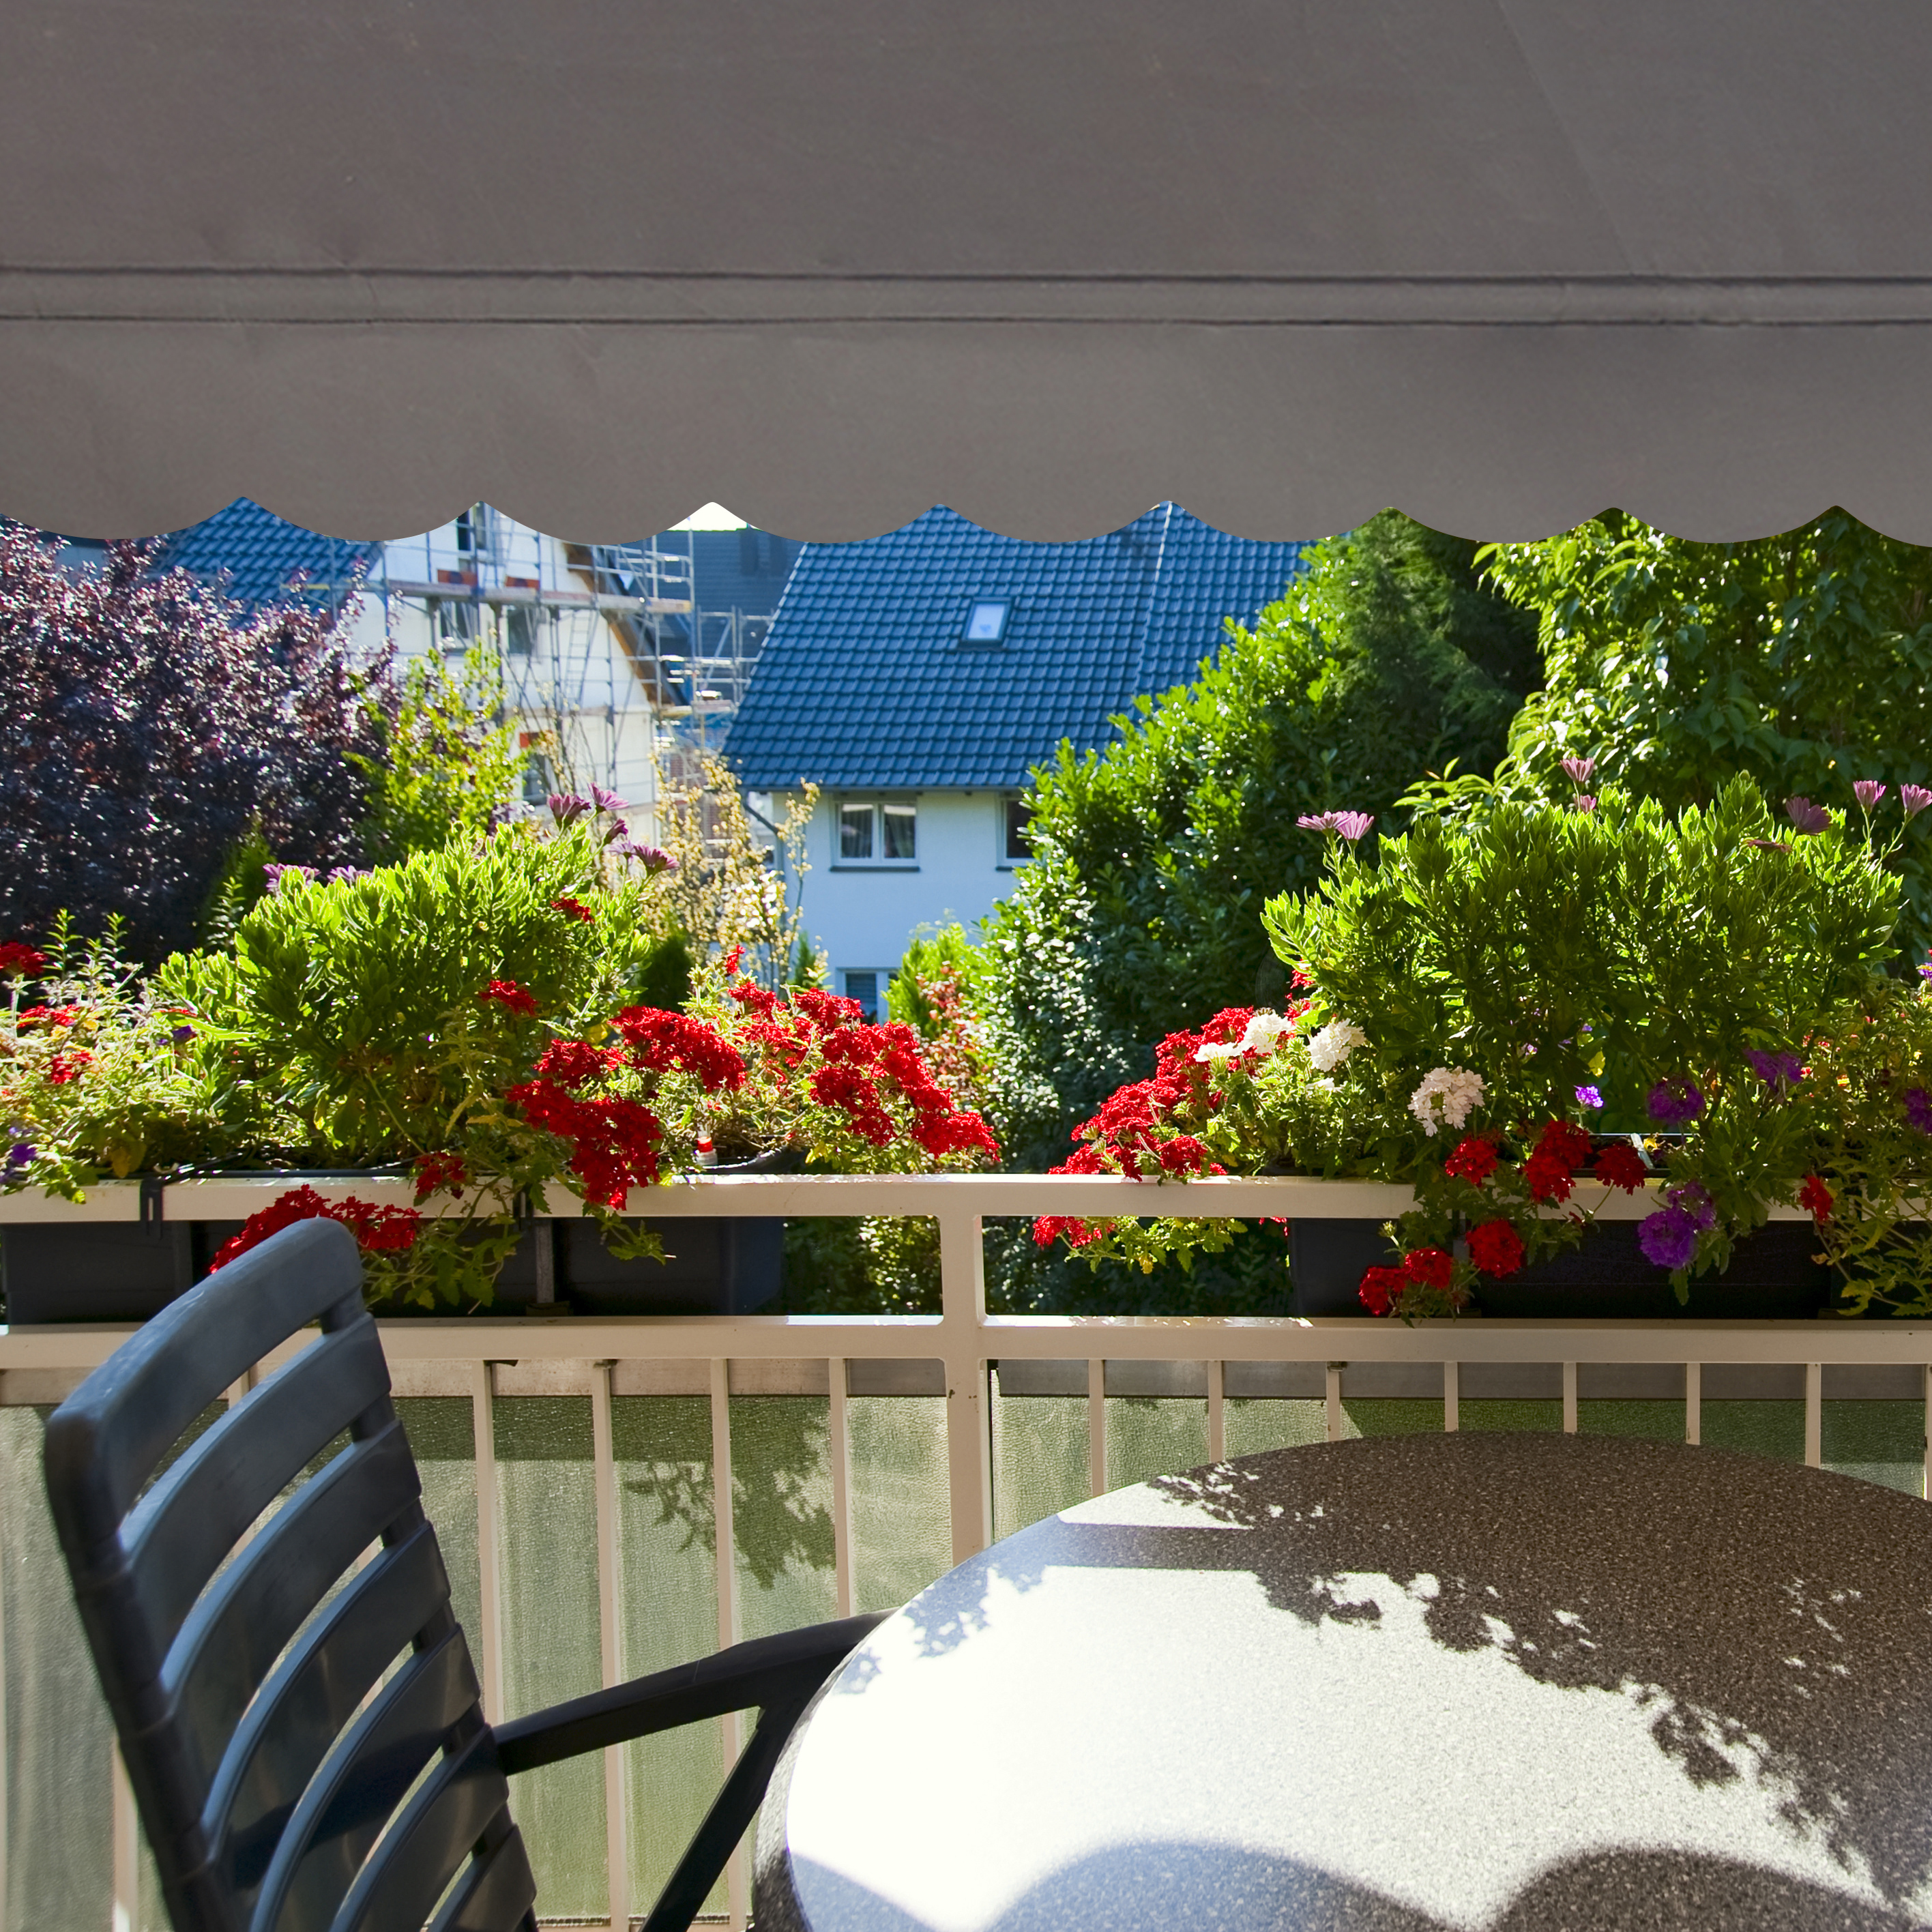 klemmmarkise balkon markise balkonmarkise sonnenmarkise sonnendach grau gestell ebay. Black Bedroom Furniture Sets. Home Design Ideas